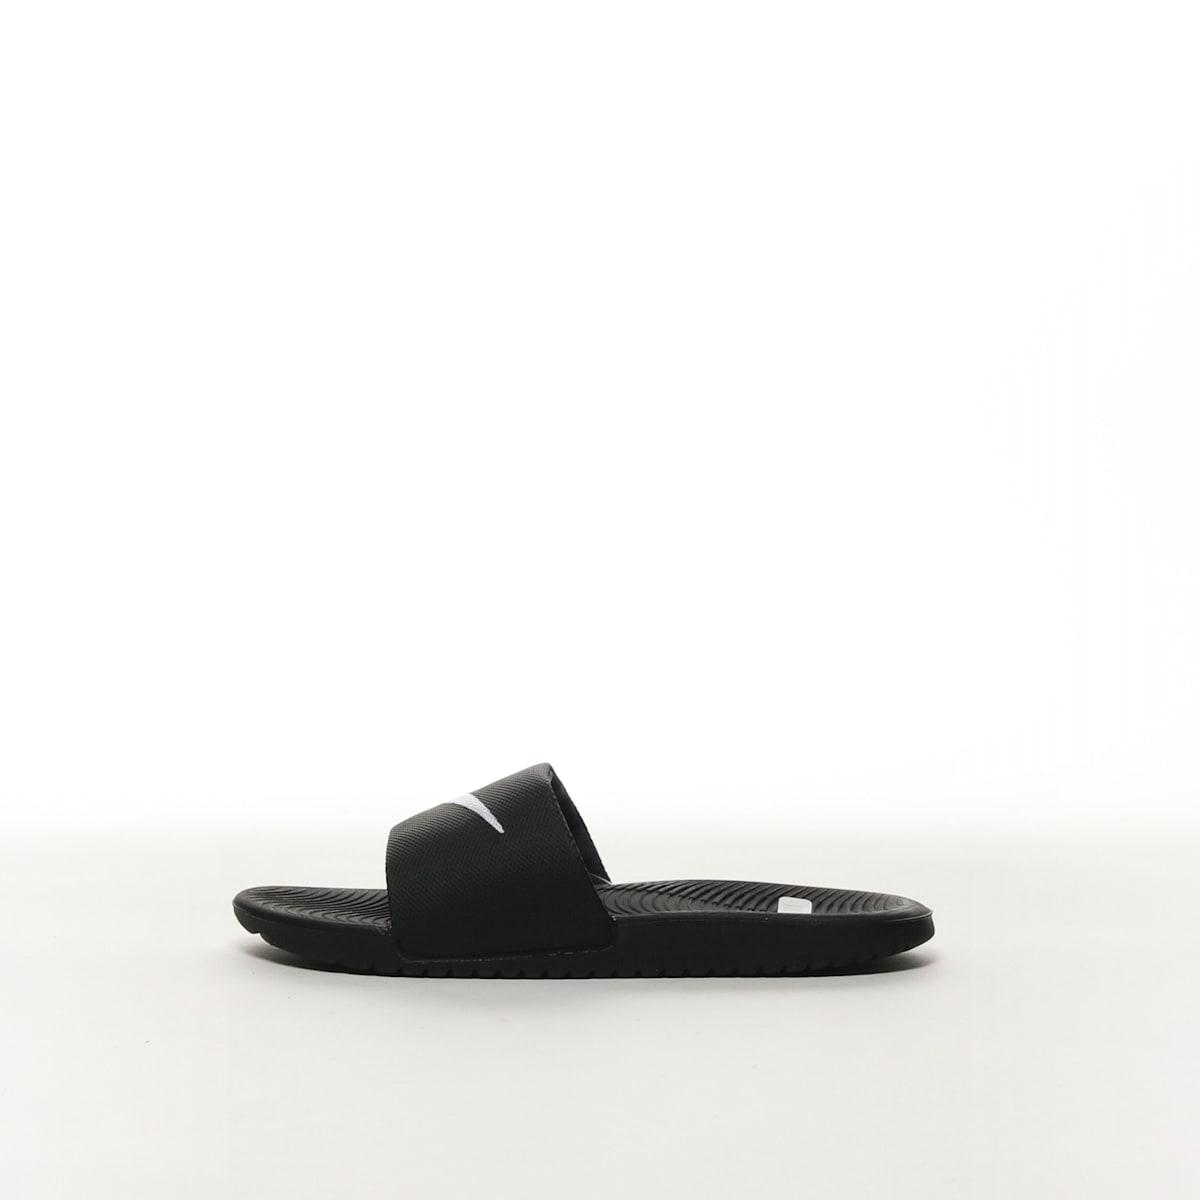 Kawa slide